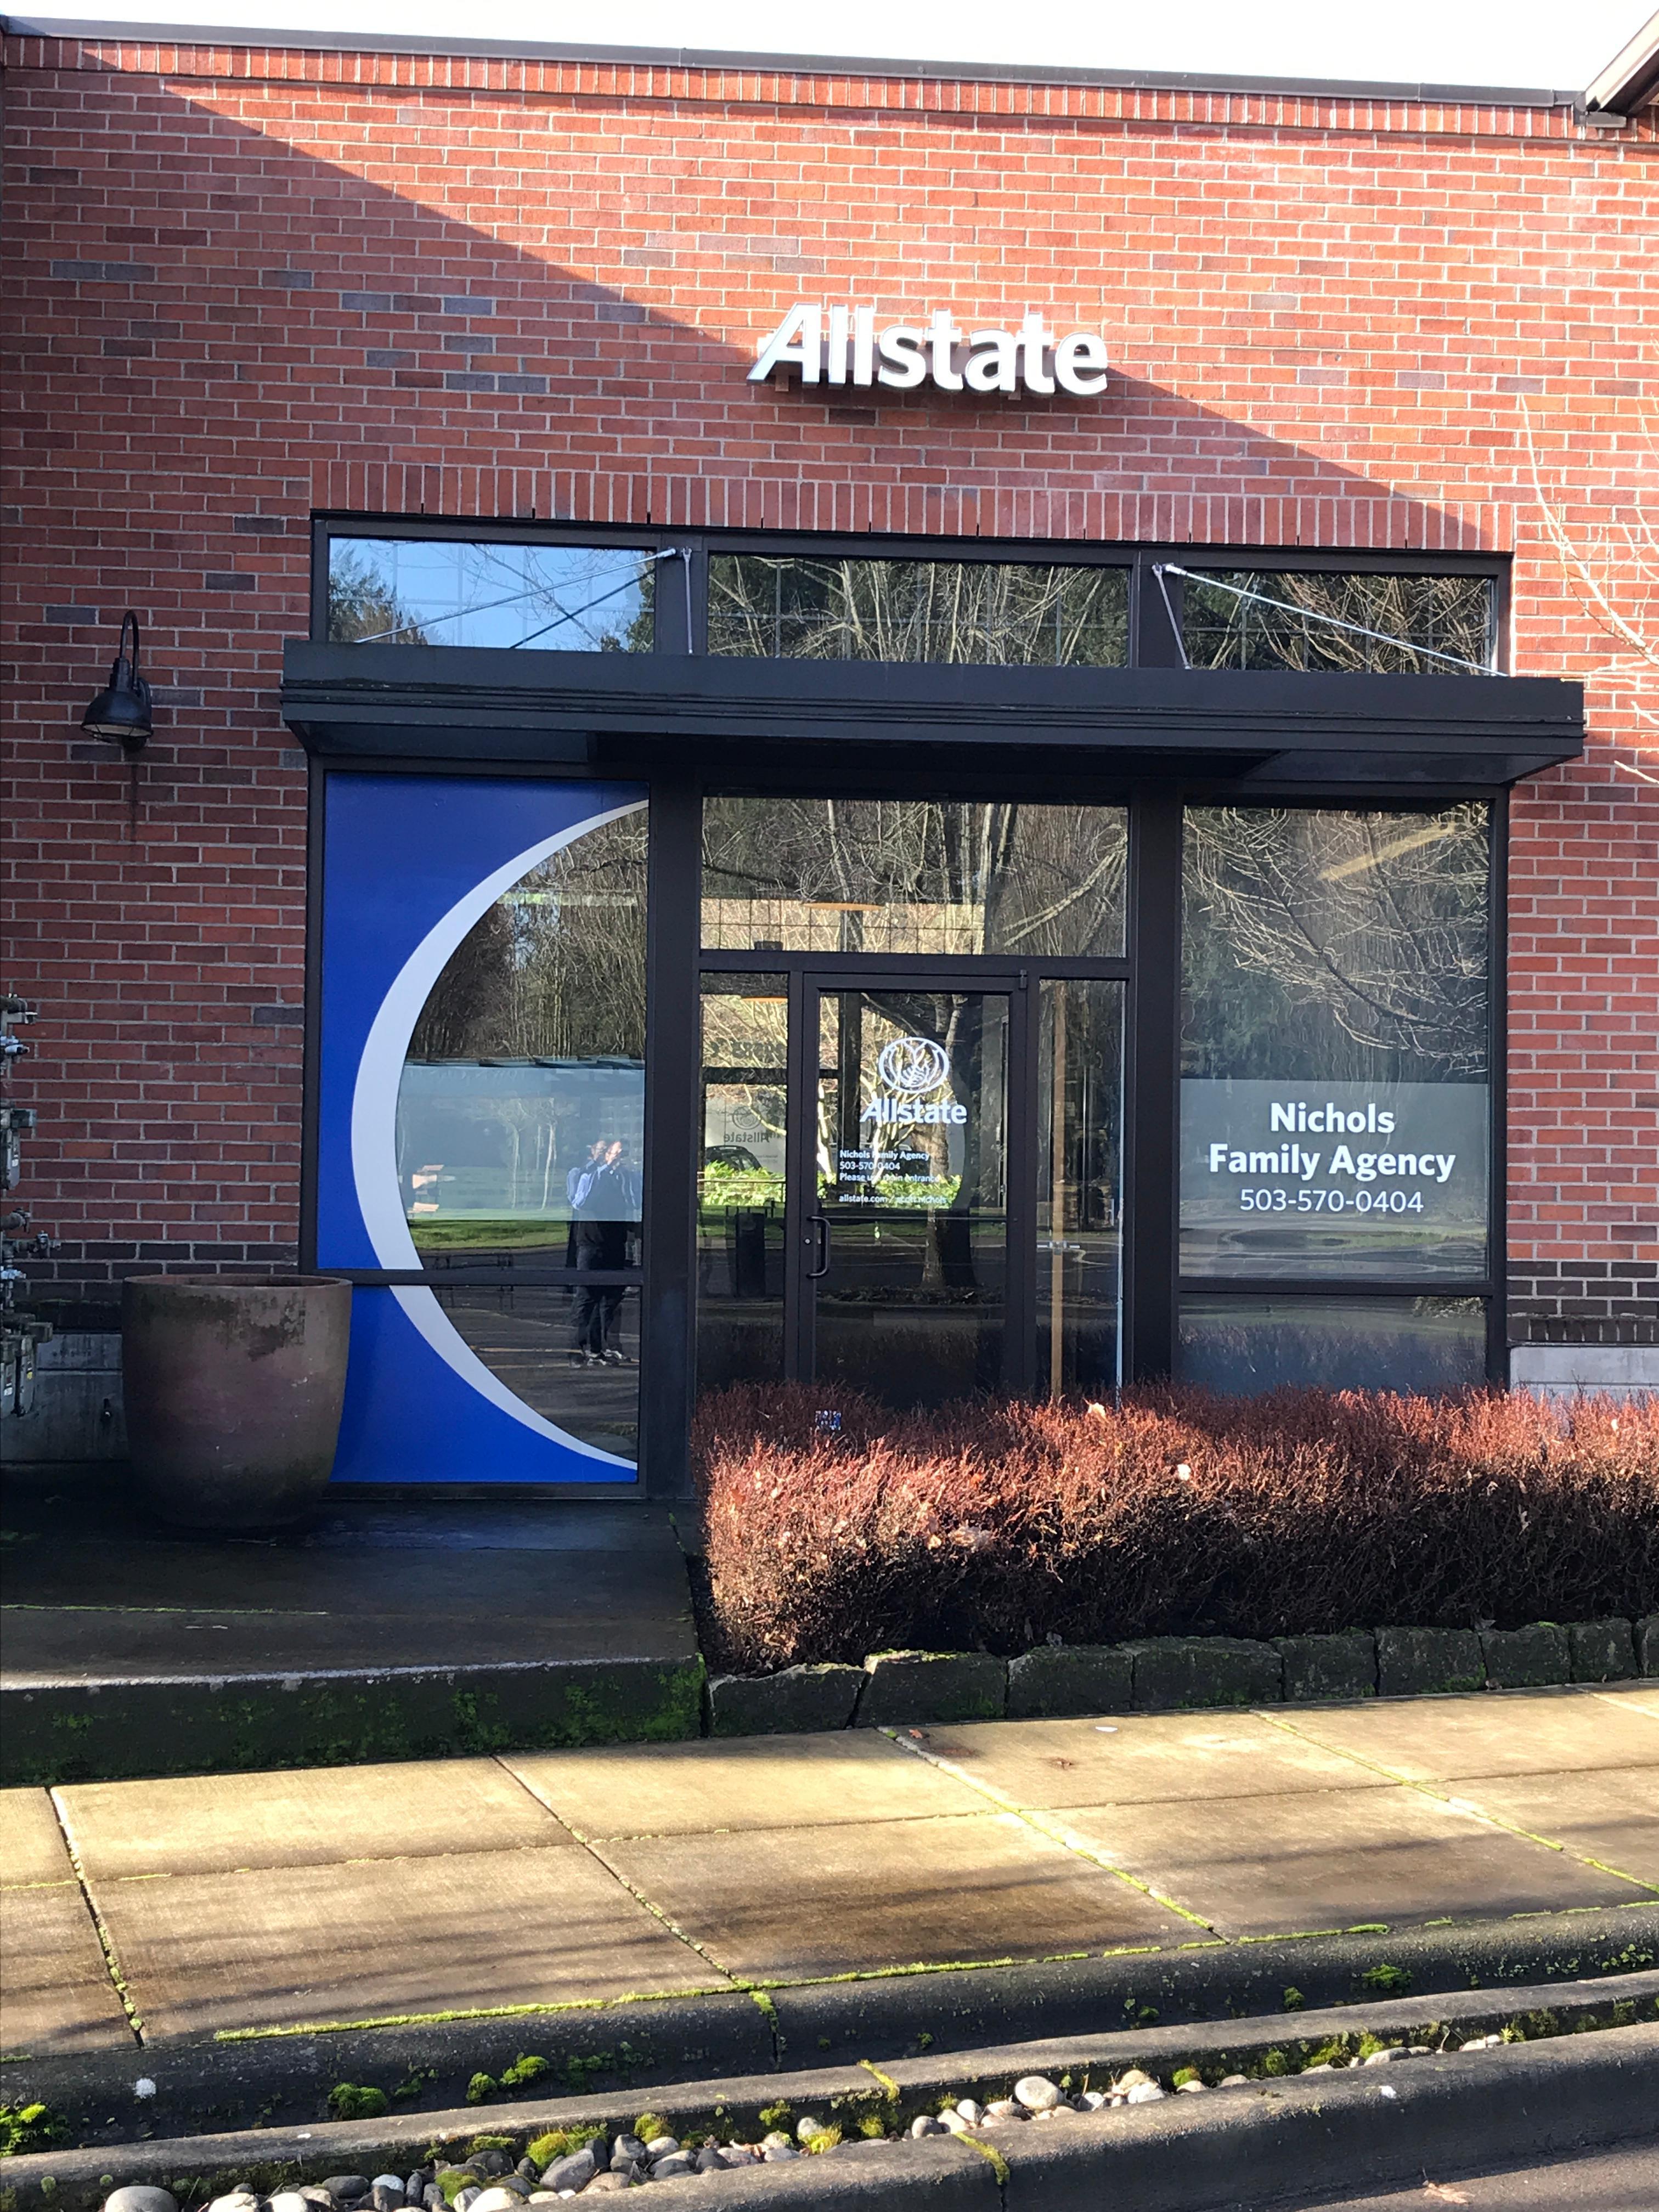 Nichols Family Agency: Allstate Insurance image 10